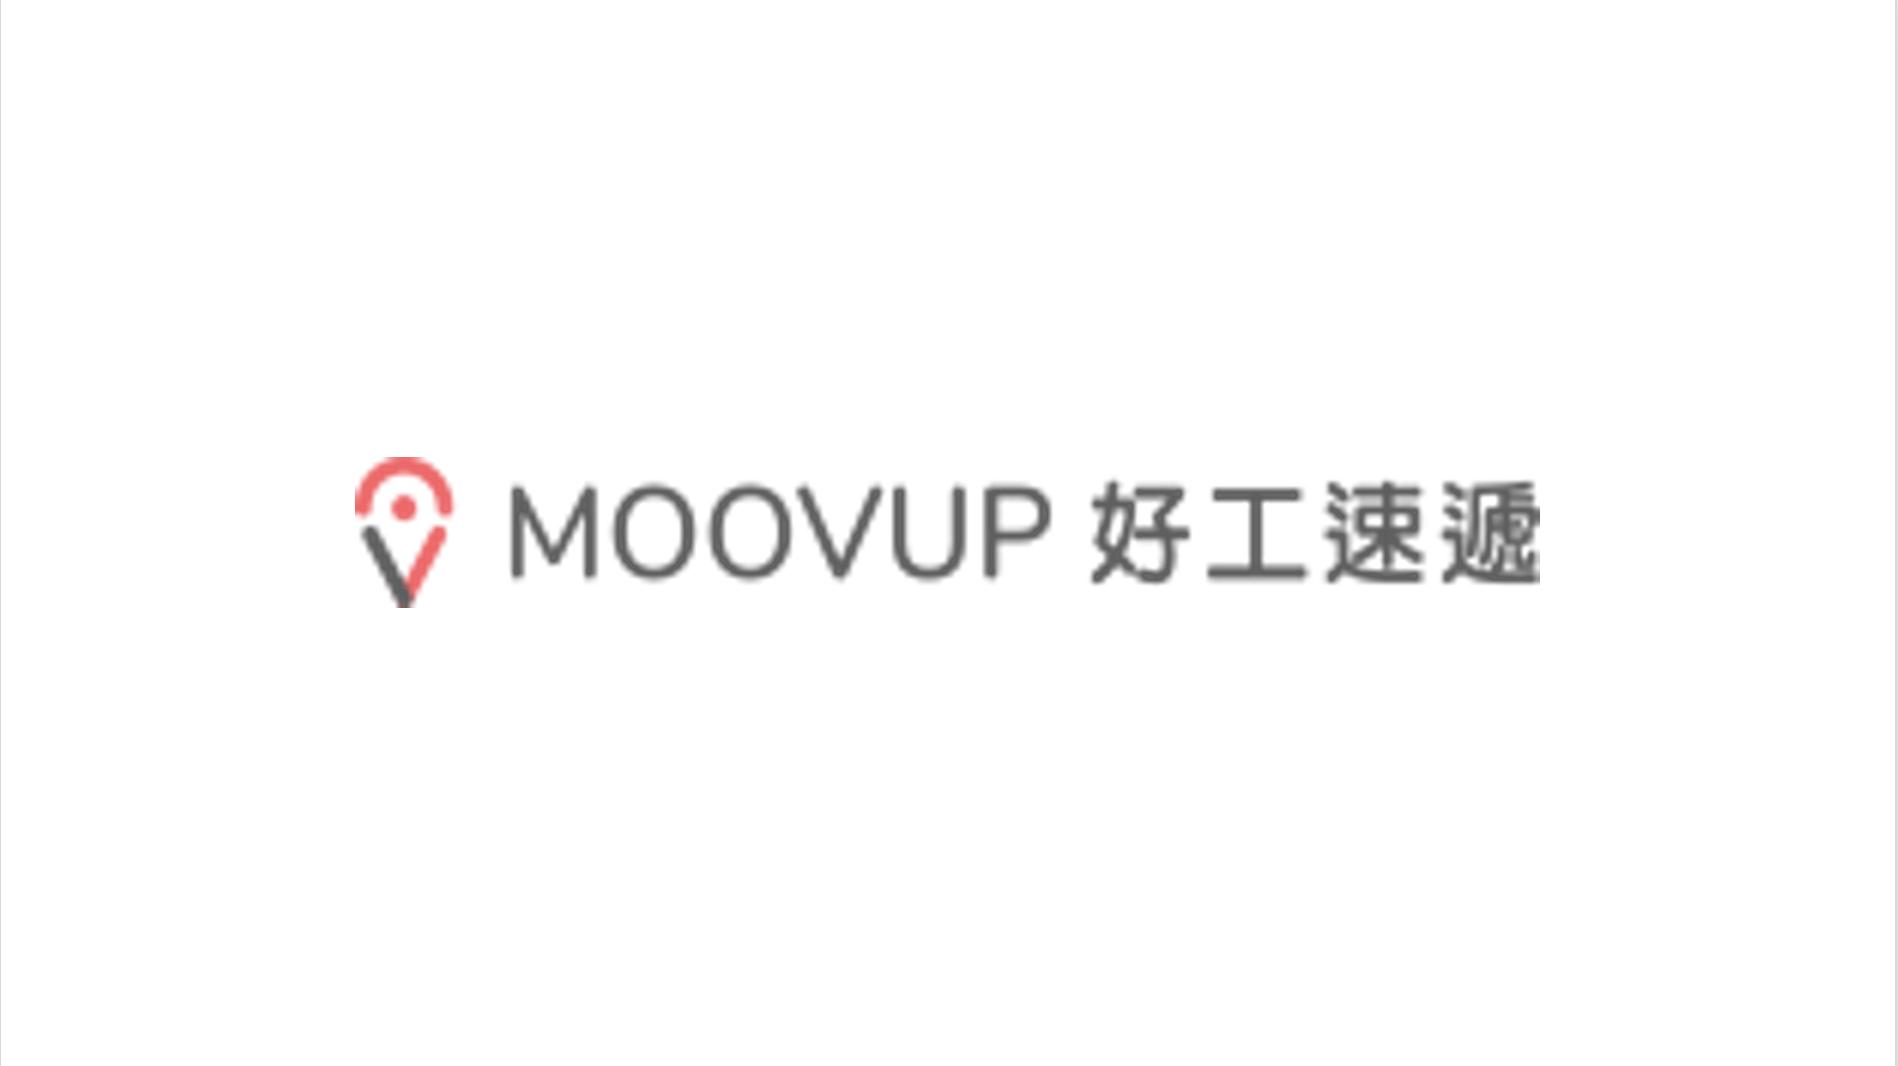 Moovup 好工速遞 (HK)